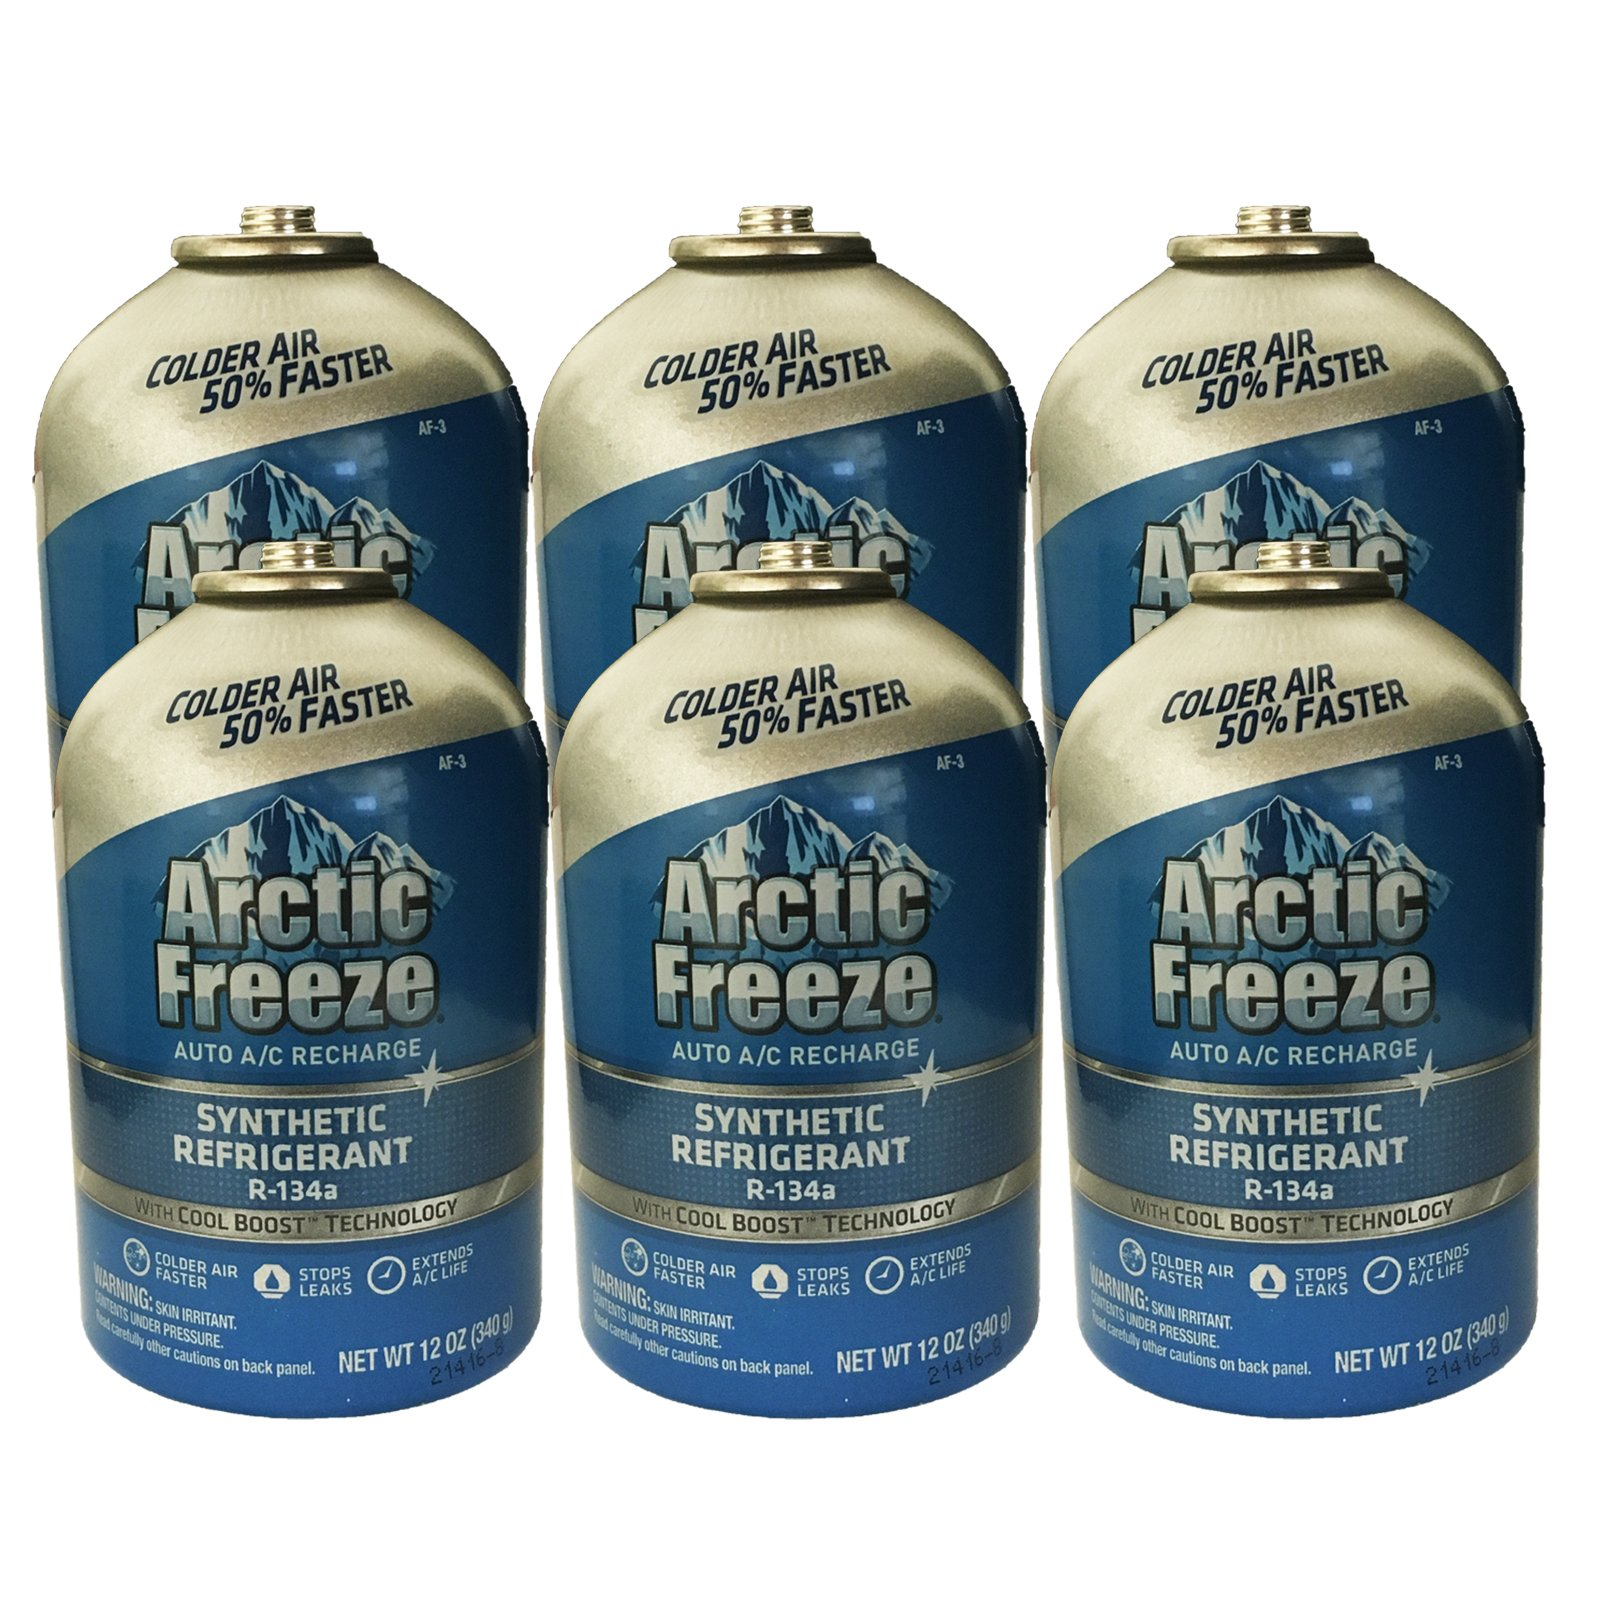 Interdynamics (AF-3) Arctic R-134a Ultra Synthetic Freeze Refrigerant - 12 oz. 6 Cans